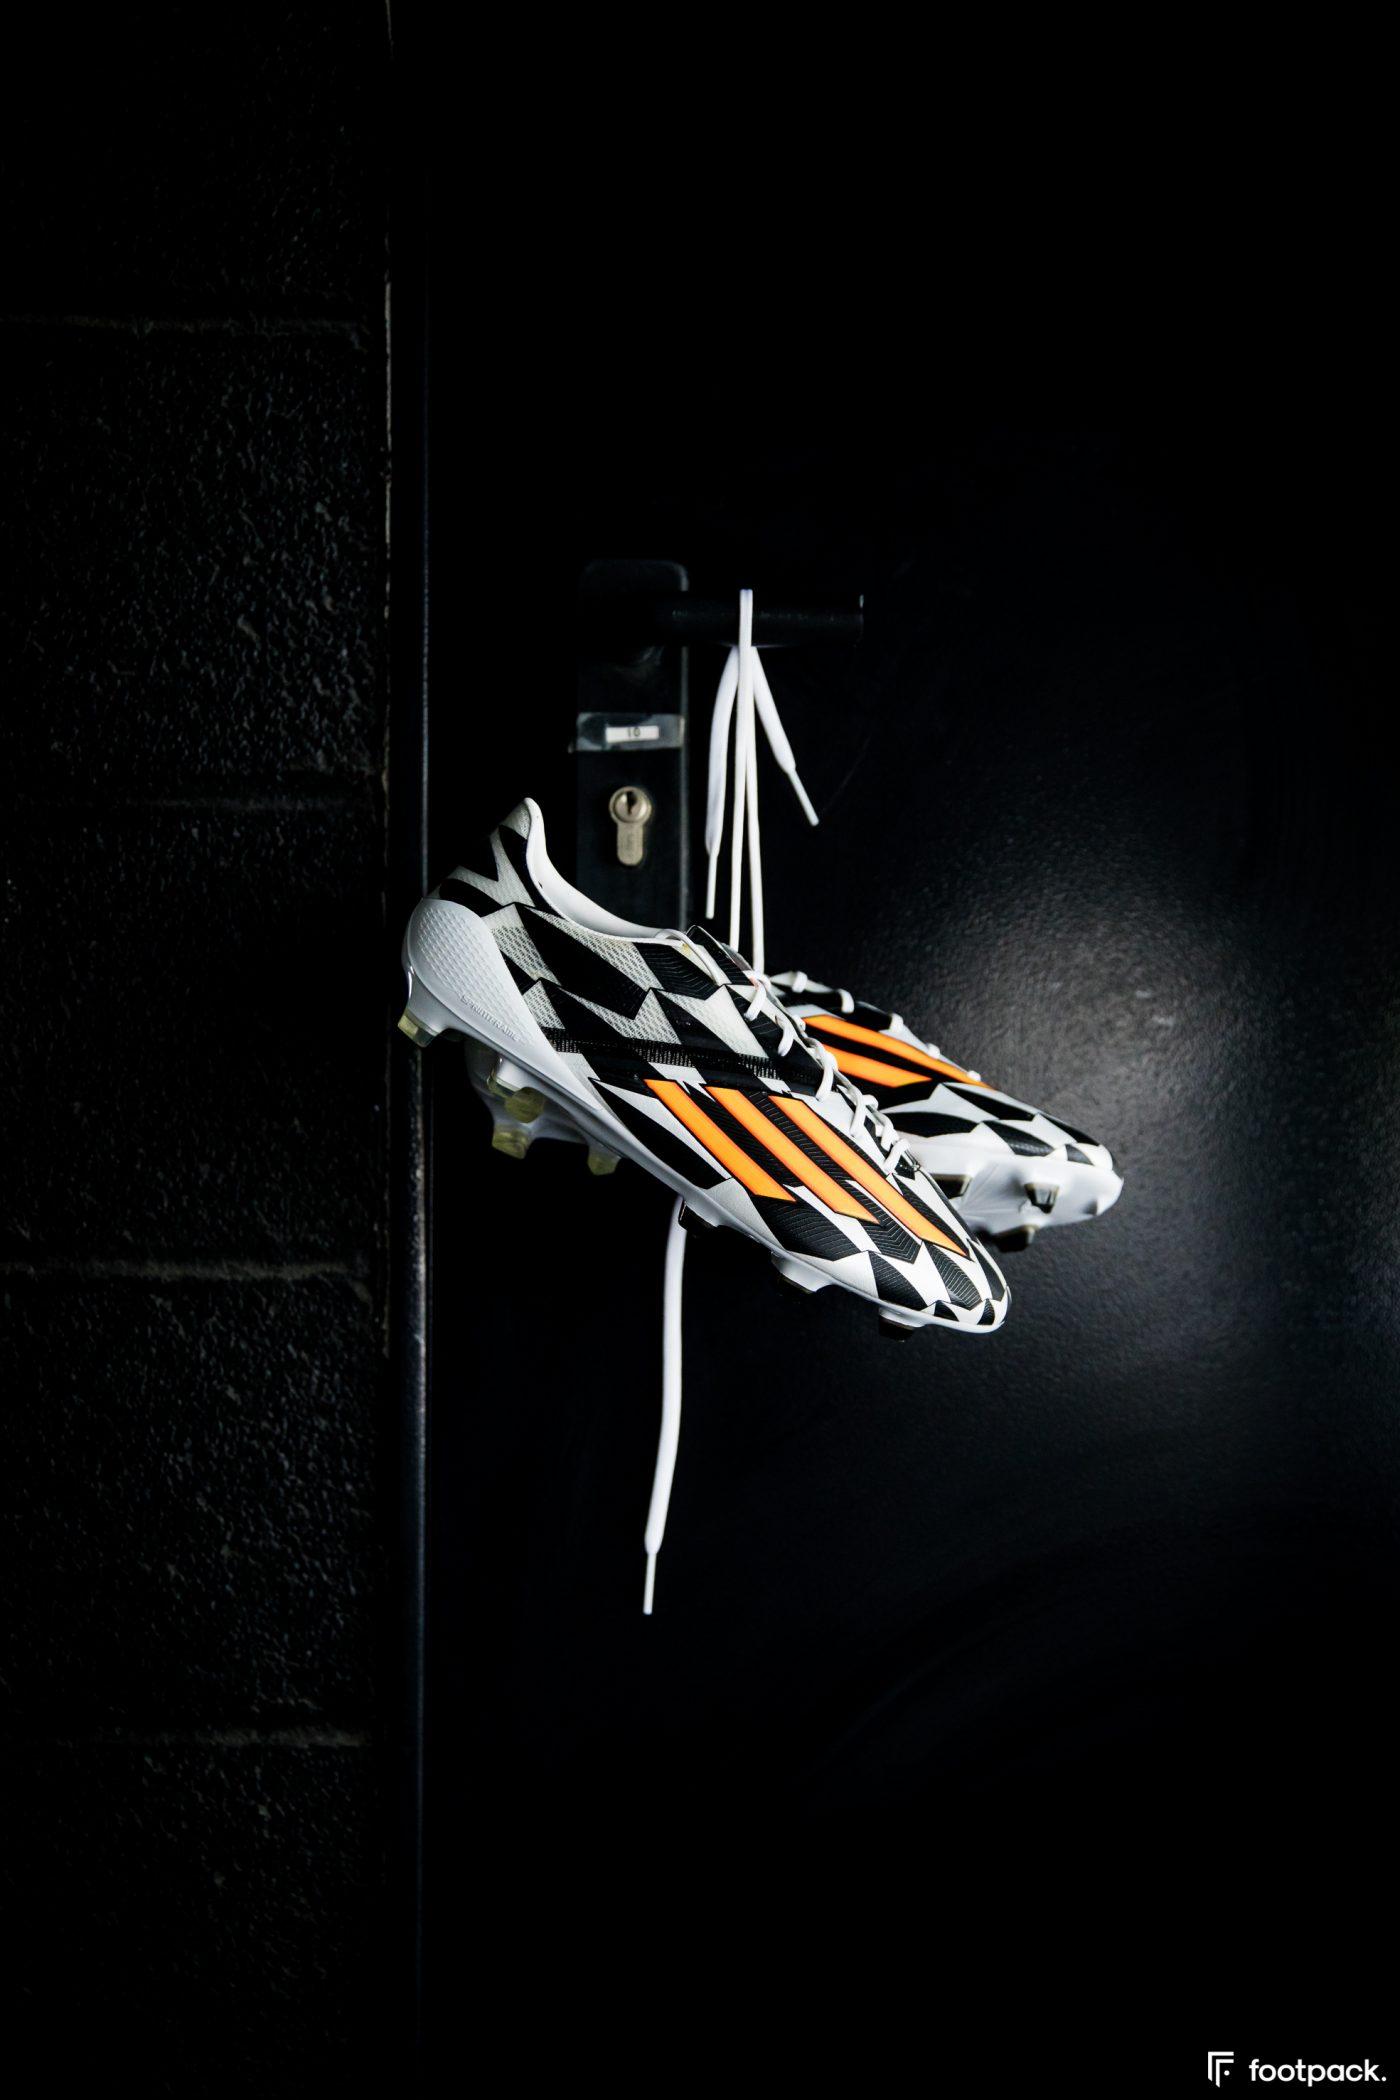 adidas-F50-adizero-battle-pack-coupe-du-monde-2014-footpack-6